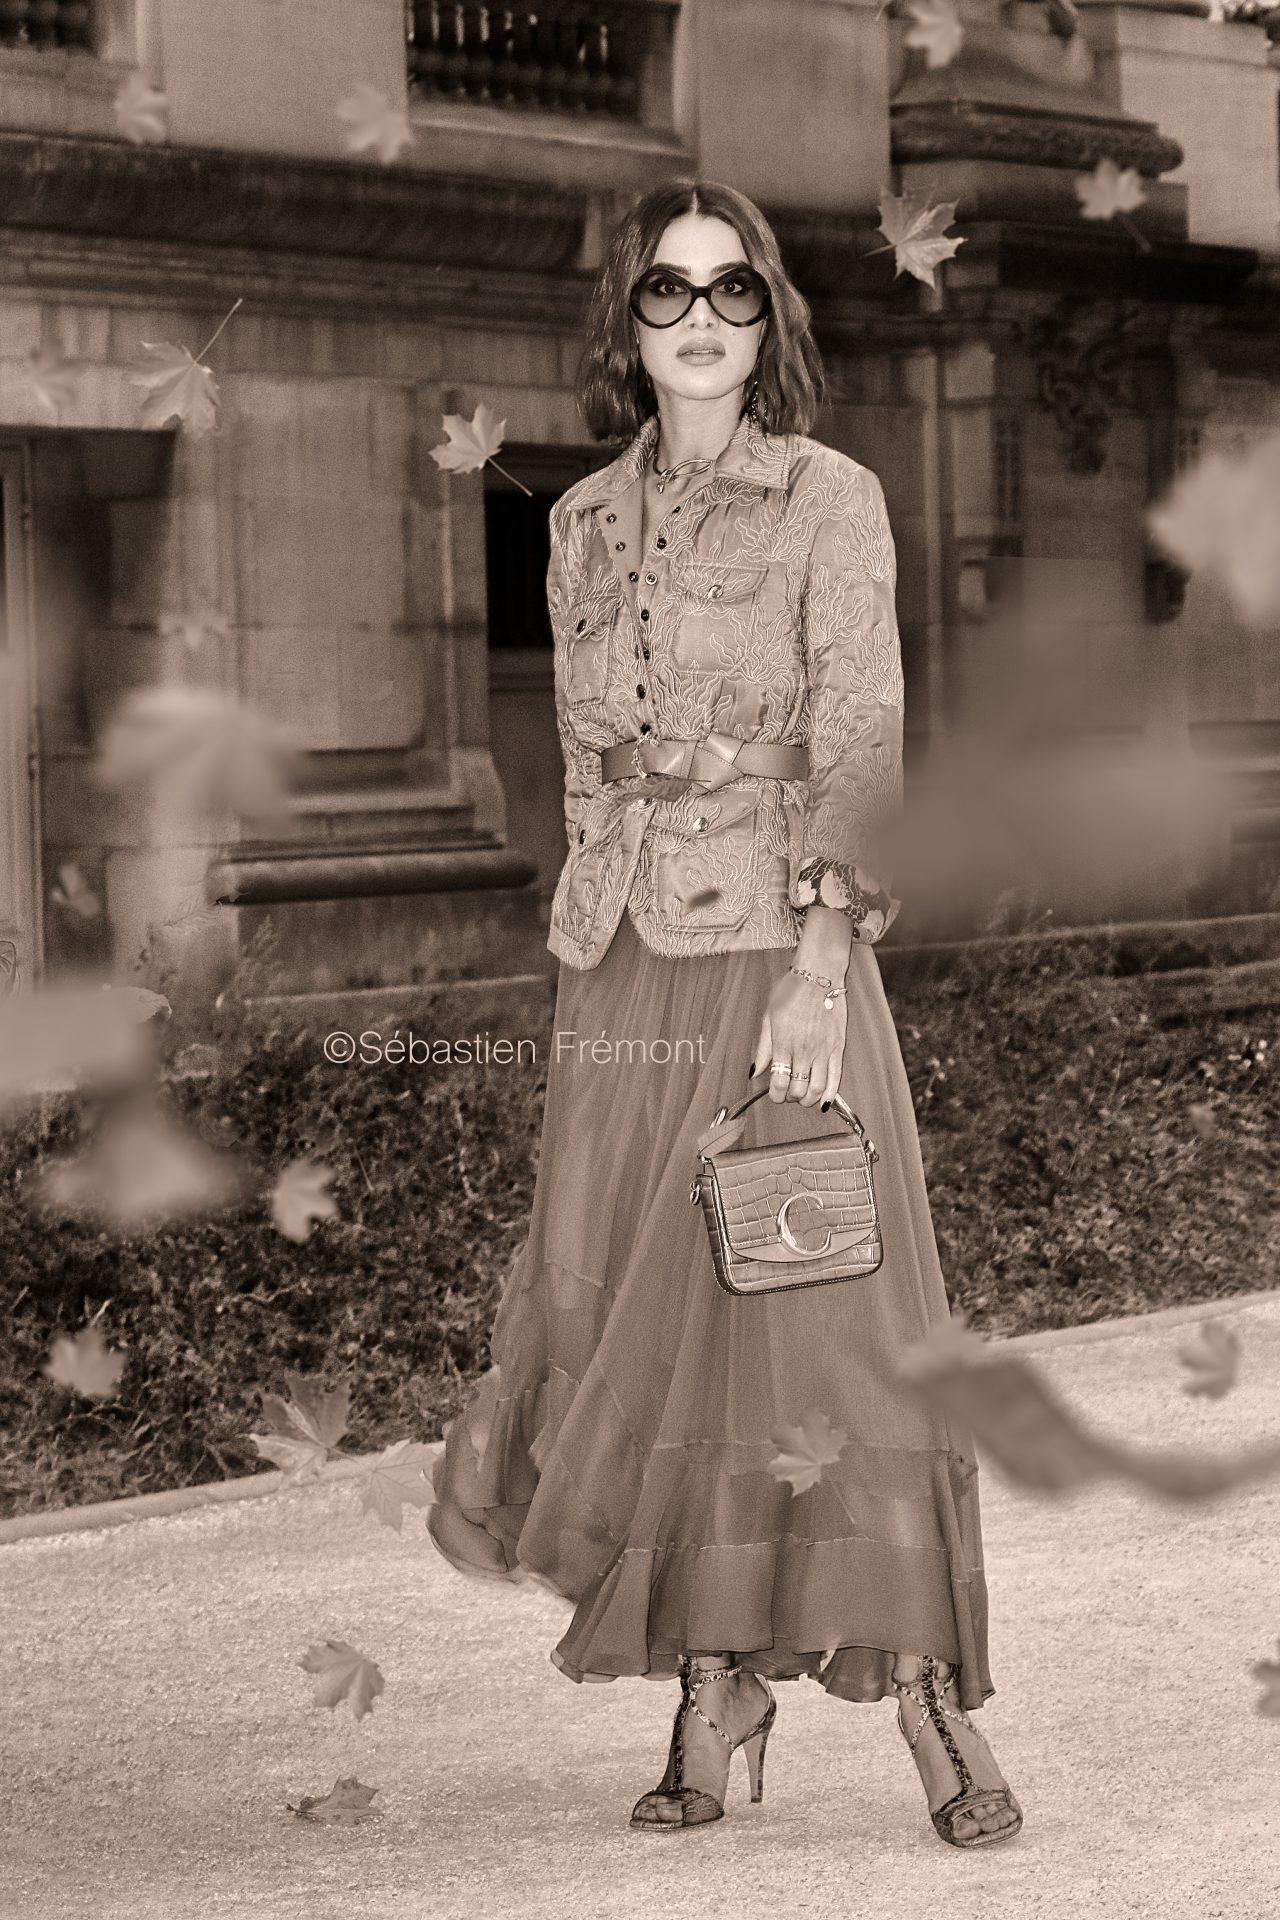 French Photographer Fashion Photography Chloe / Camila Coelho